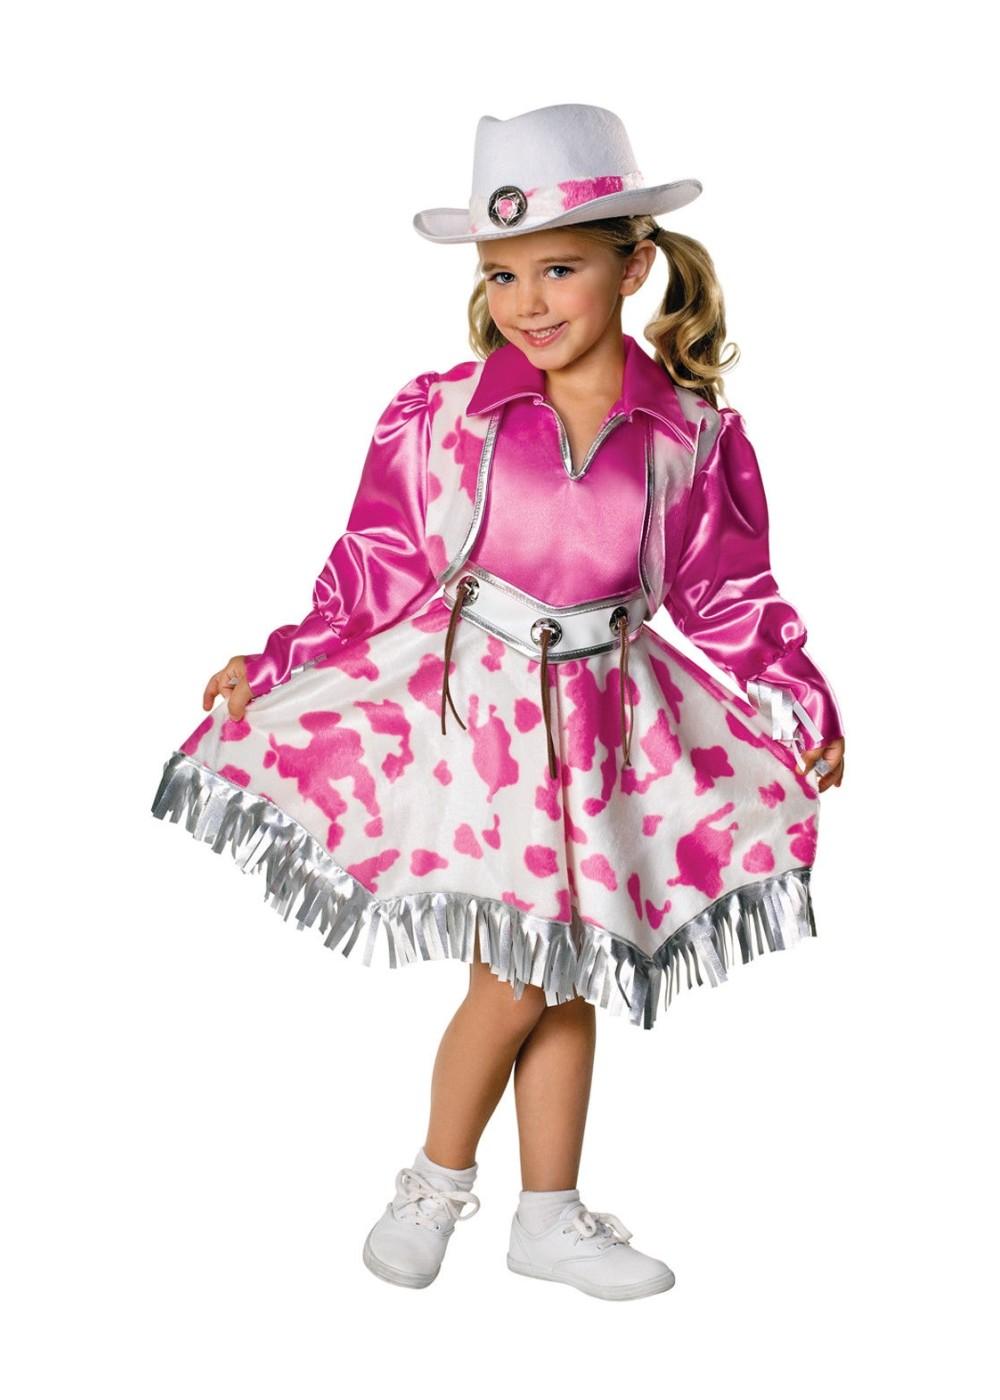 Western Diva Kids Cowgirl Costume - Girls Costume-9970